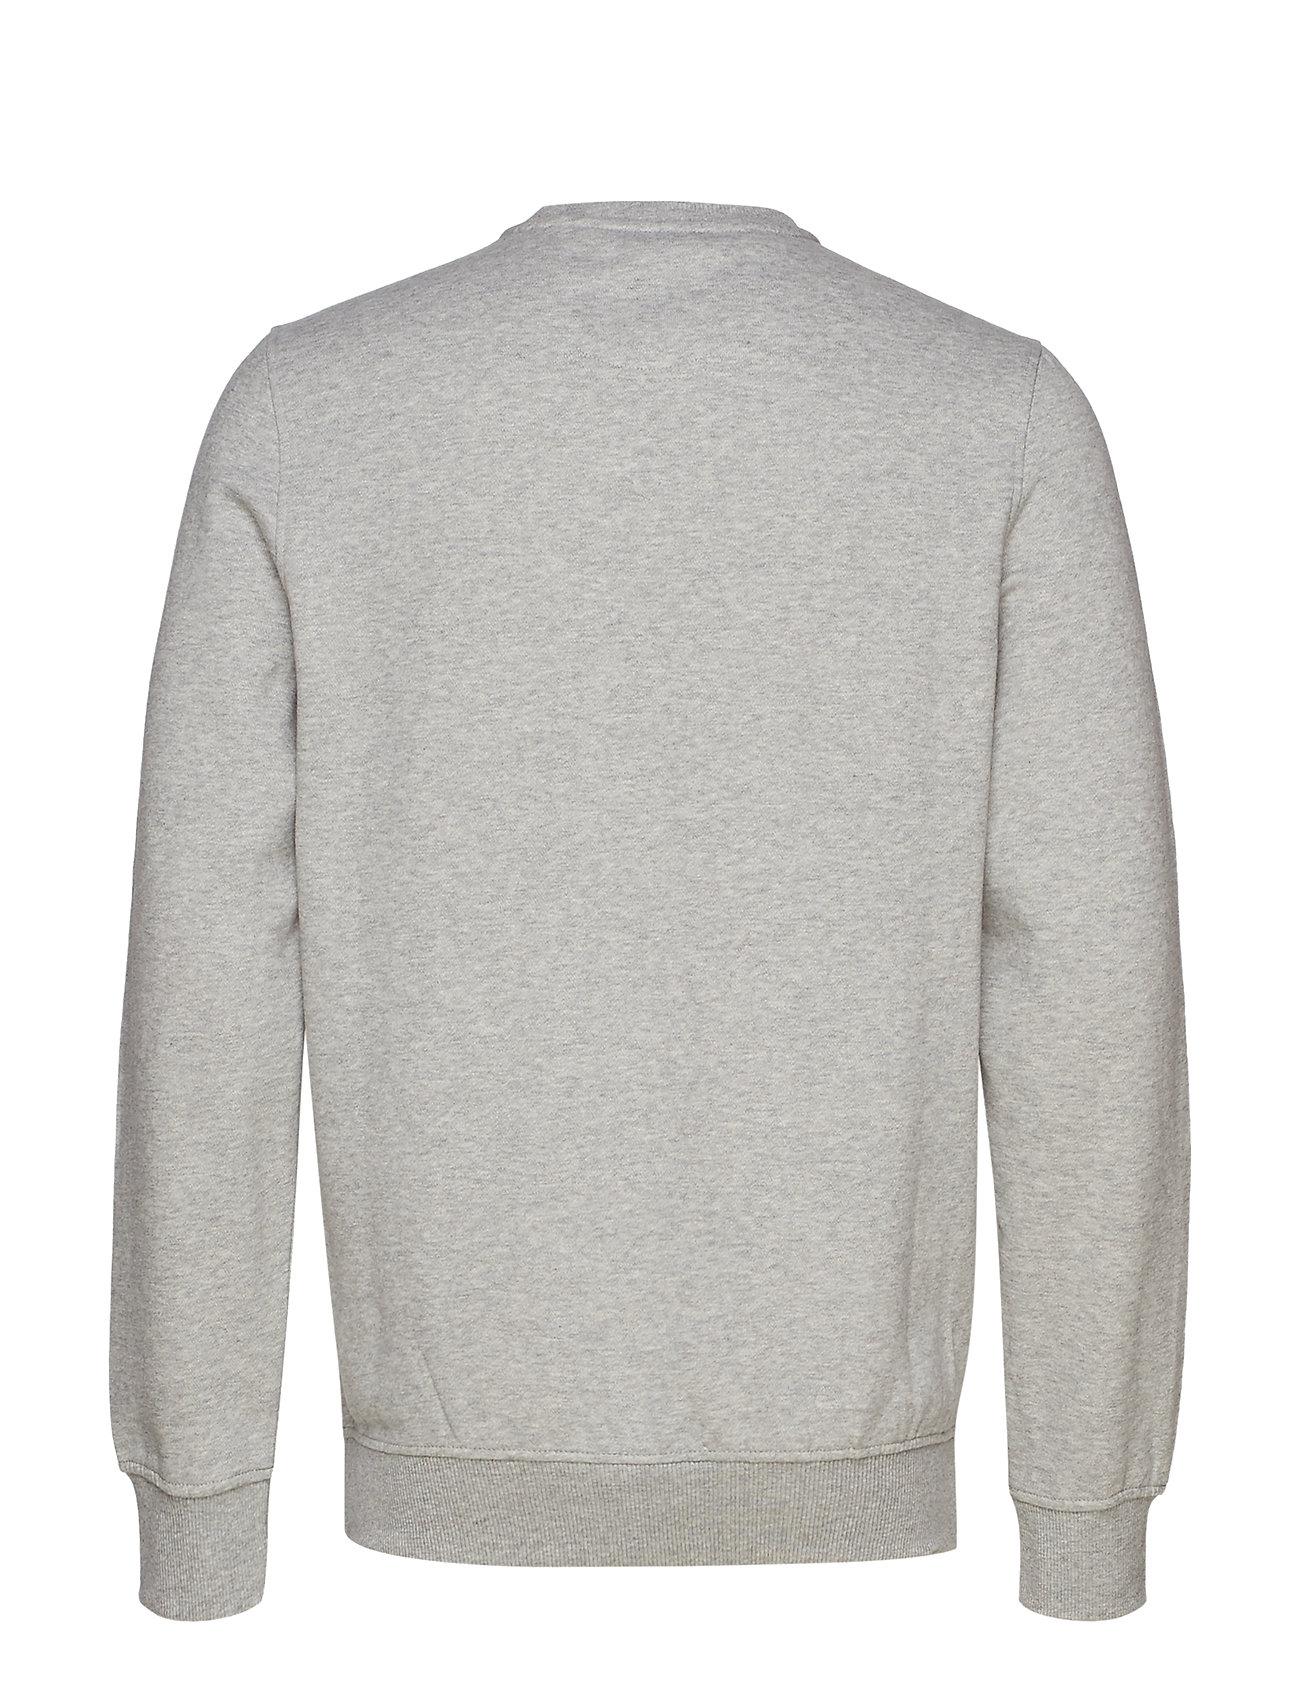 Soft Solid Grey HtrIzod Super Fleece Crewlight ChrsdxtQ